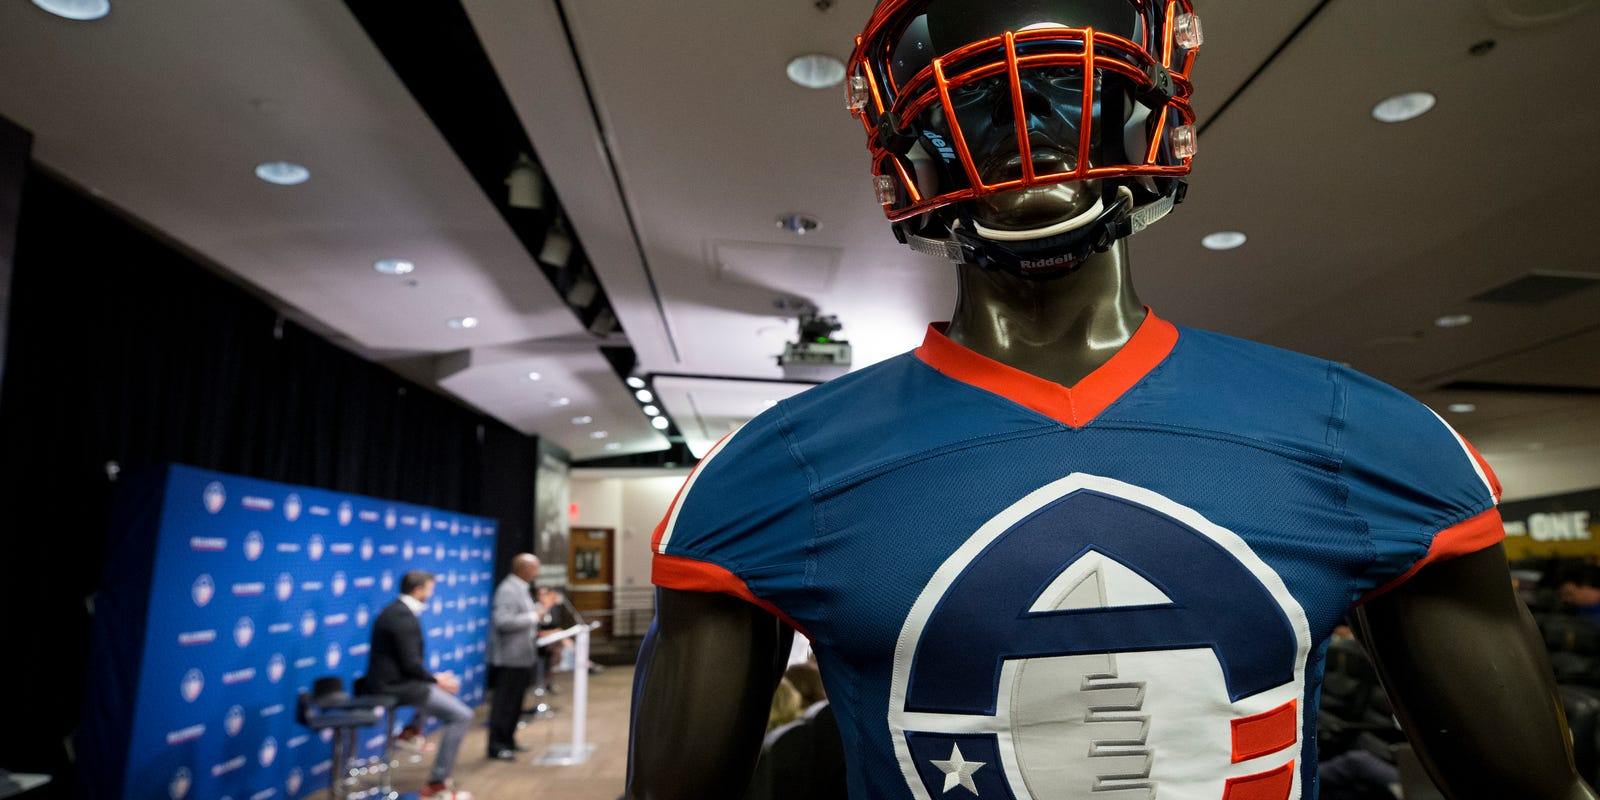 Alliance of American Football reveals four team names, logos